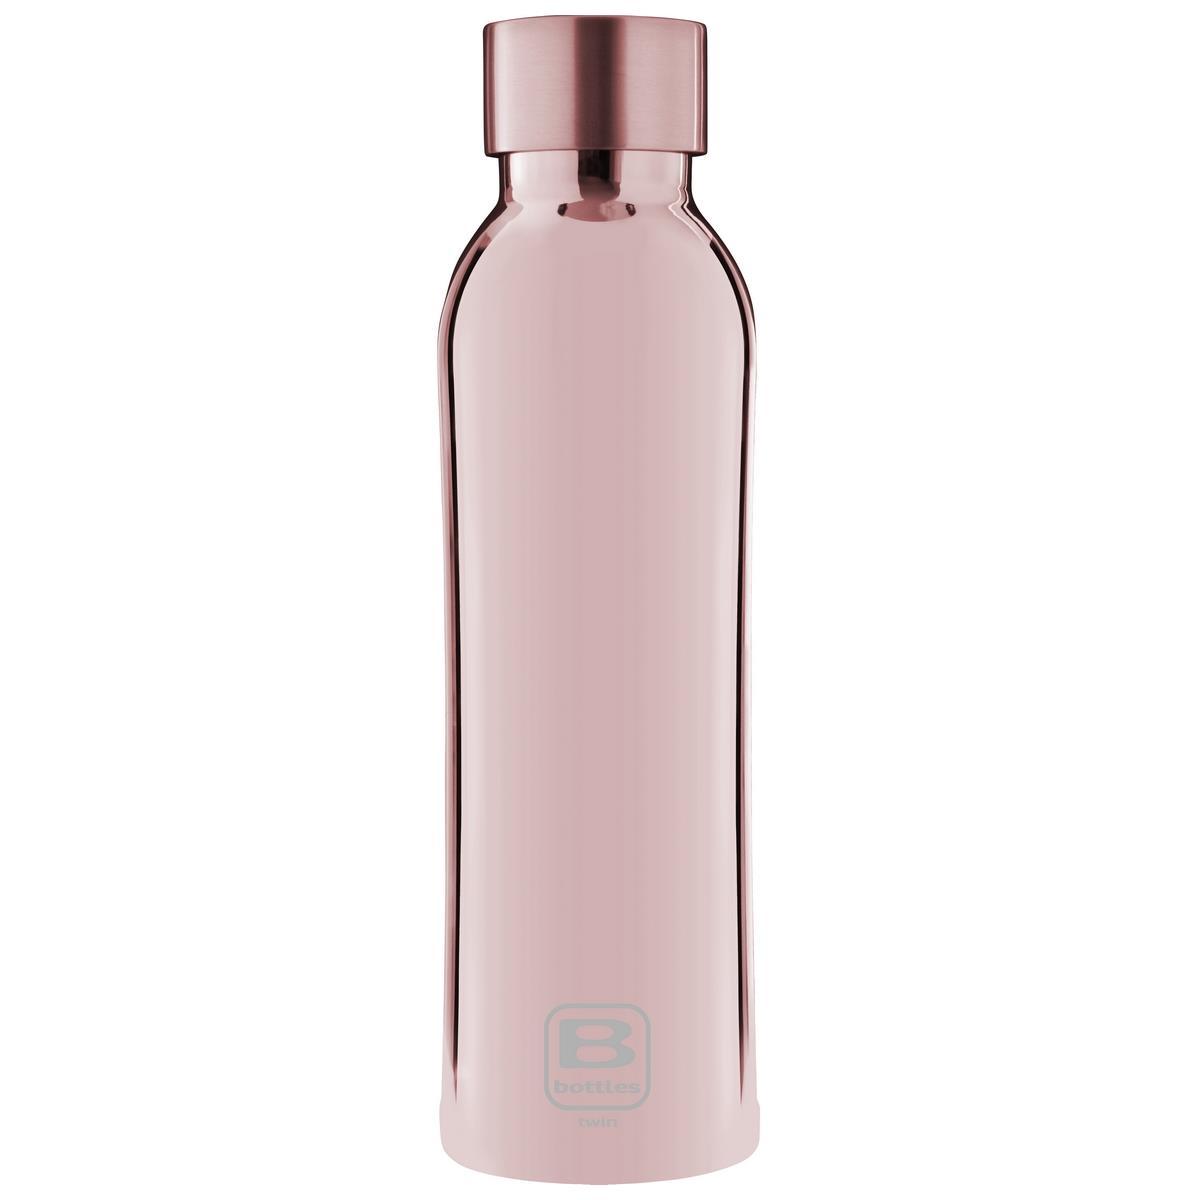 B Bottles Twin - Rose Gold Lux - 500 ml - Bottiglia Termica a doppia parete in acciaio inox 18/10